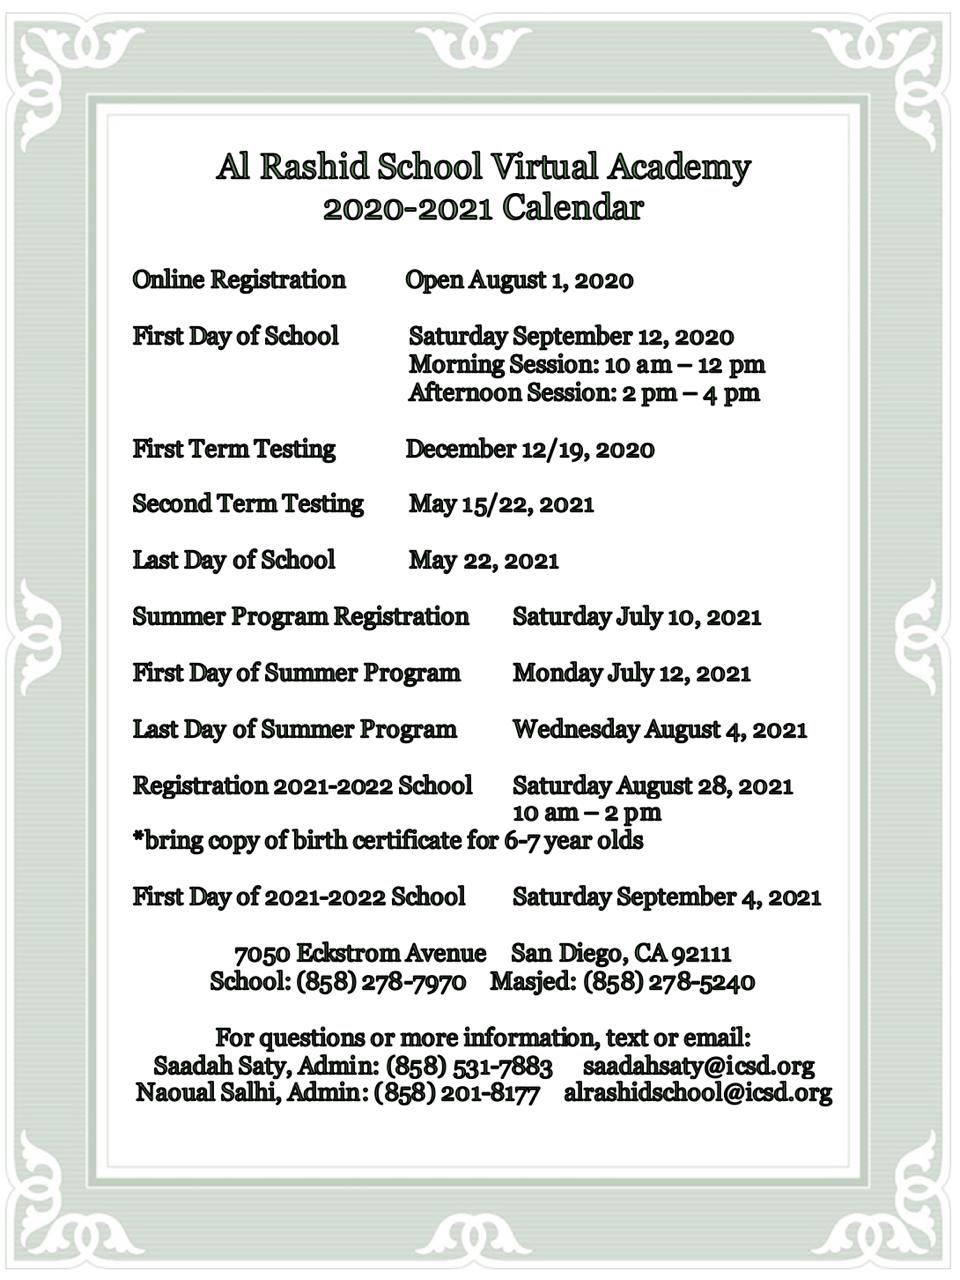 Al Rashid Virtual Academy Registration.png